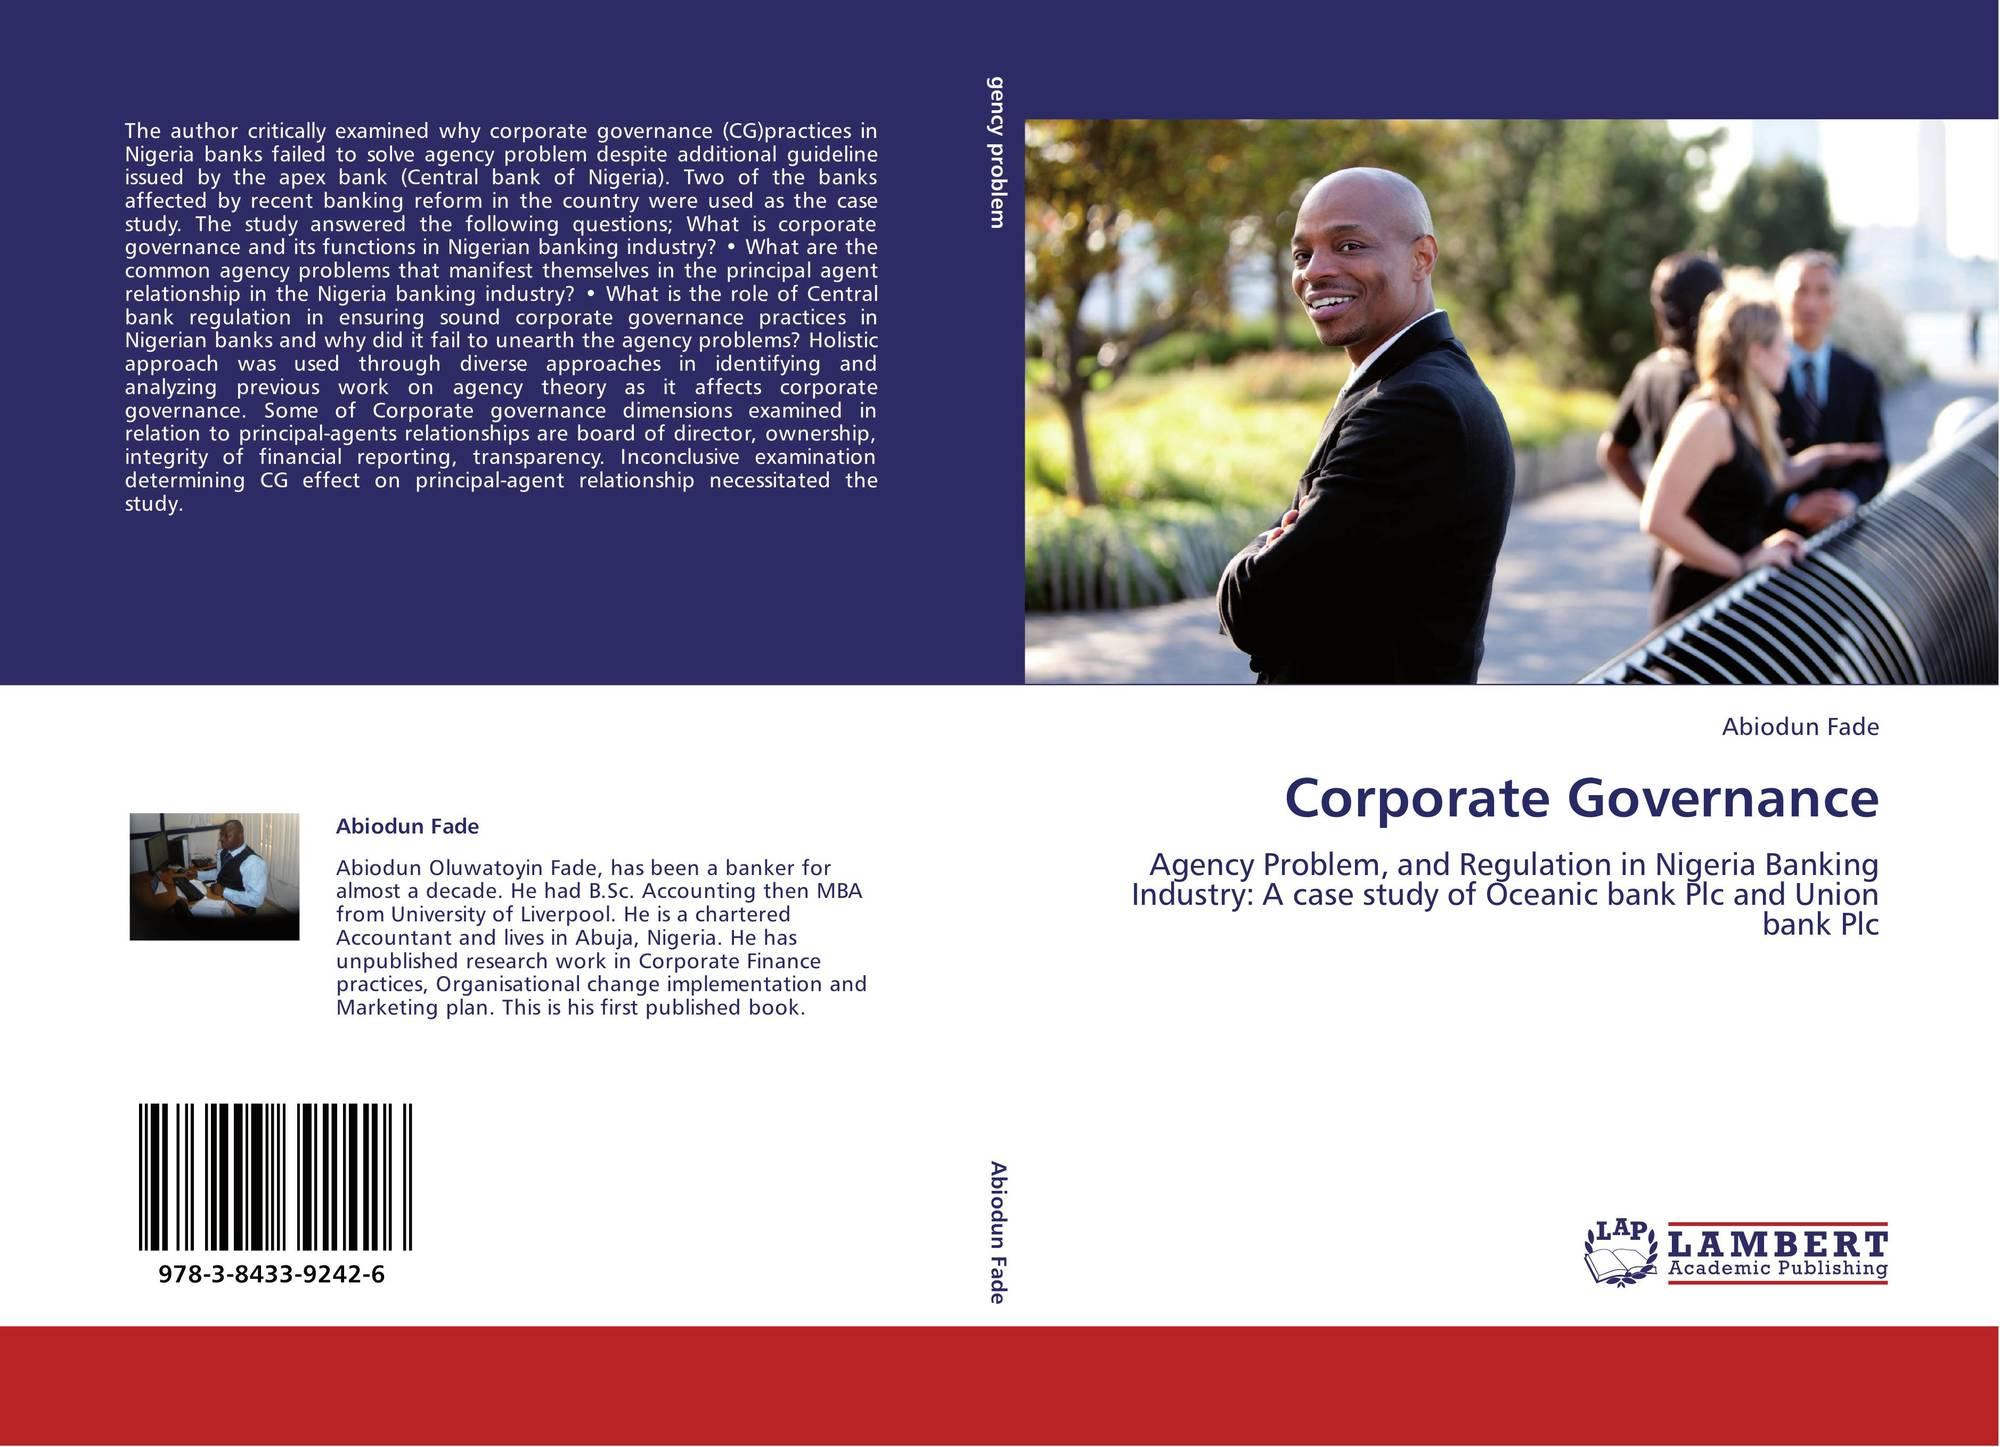 Corporate Governance, 978-3-8433-9242-6, 3843392420